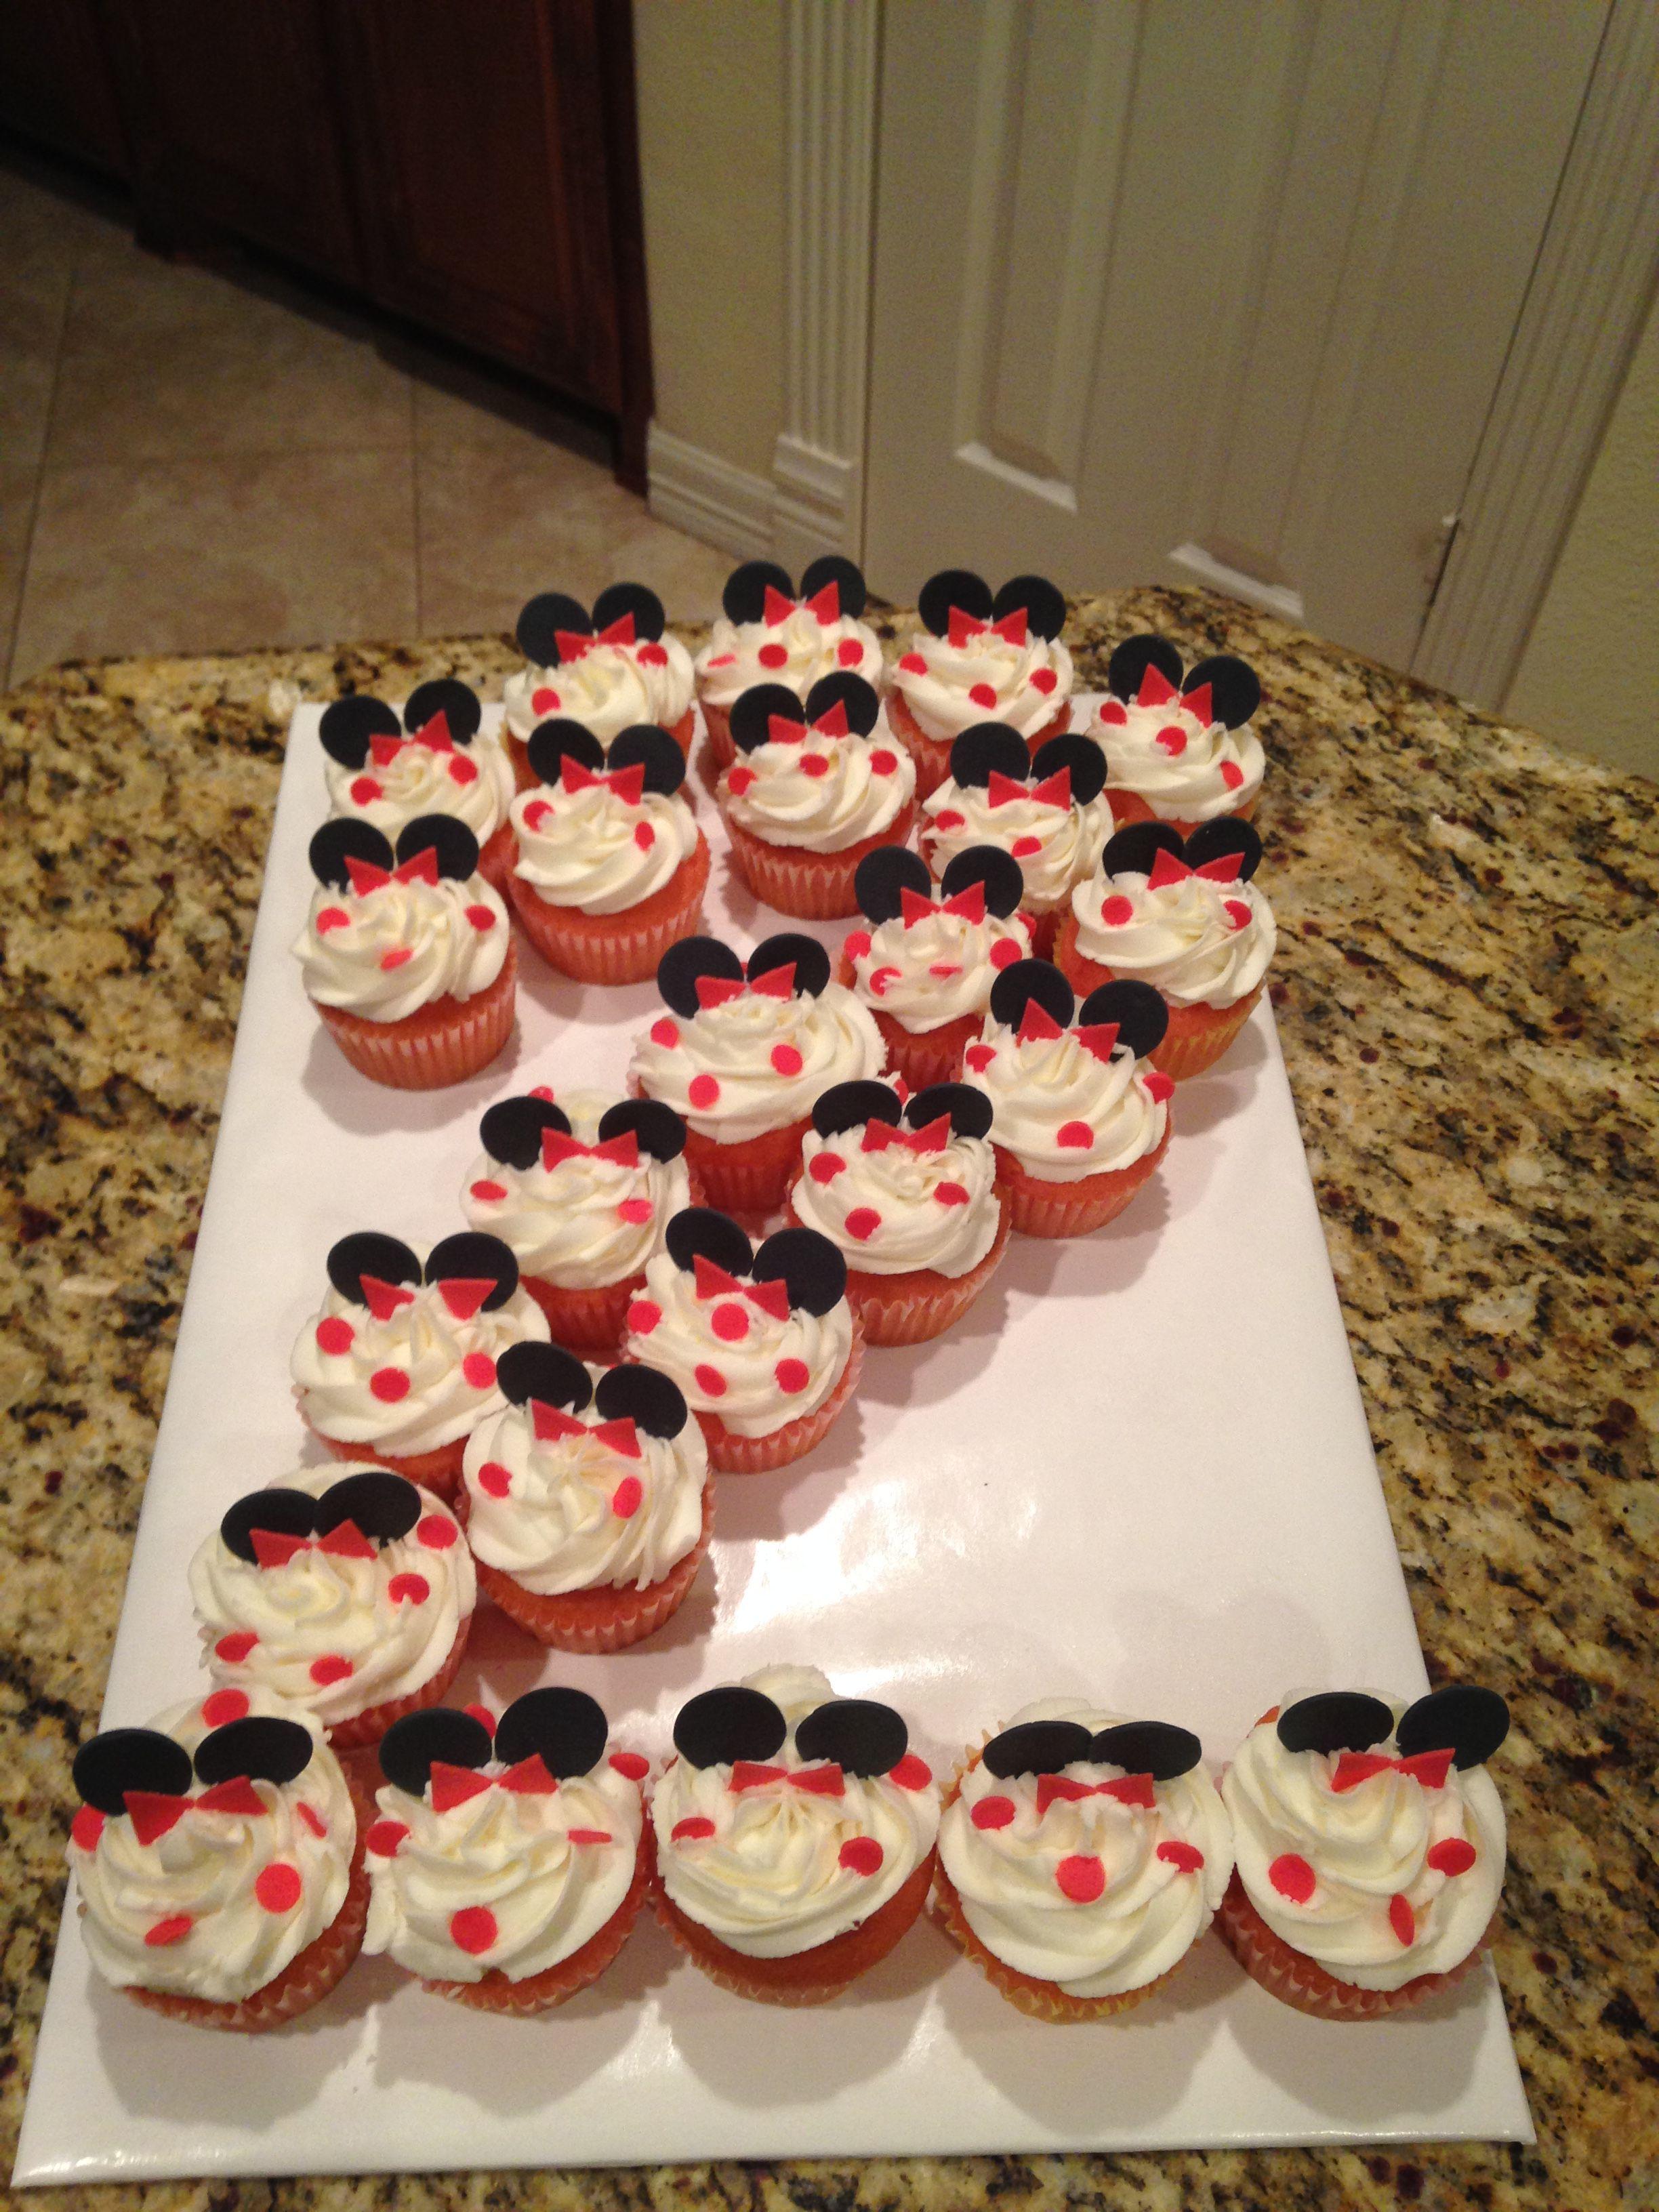 Pin By Eva Mendoza On My Cakes In